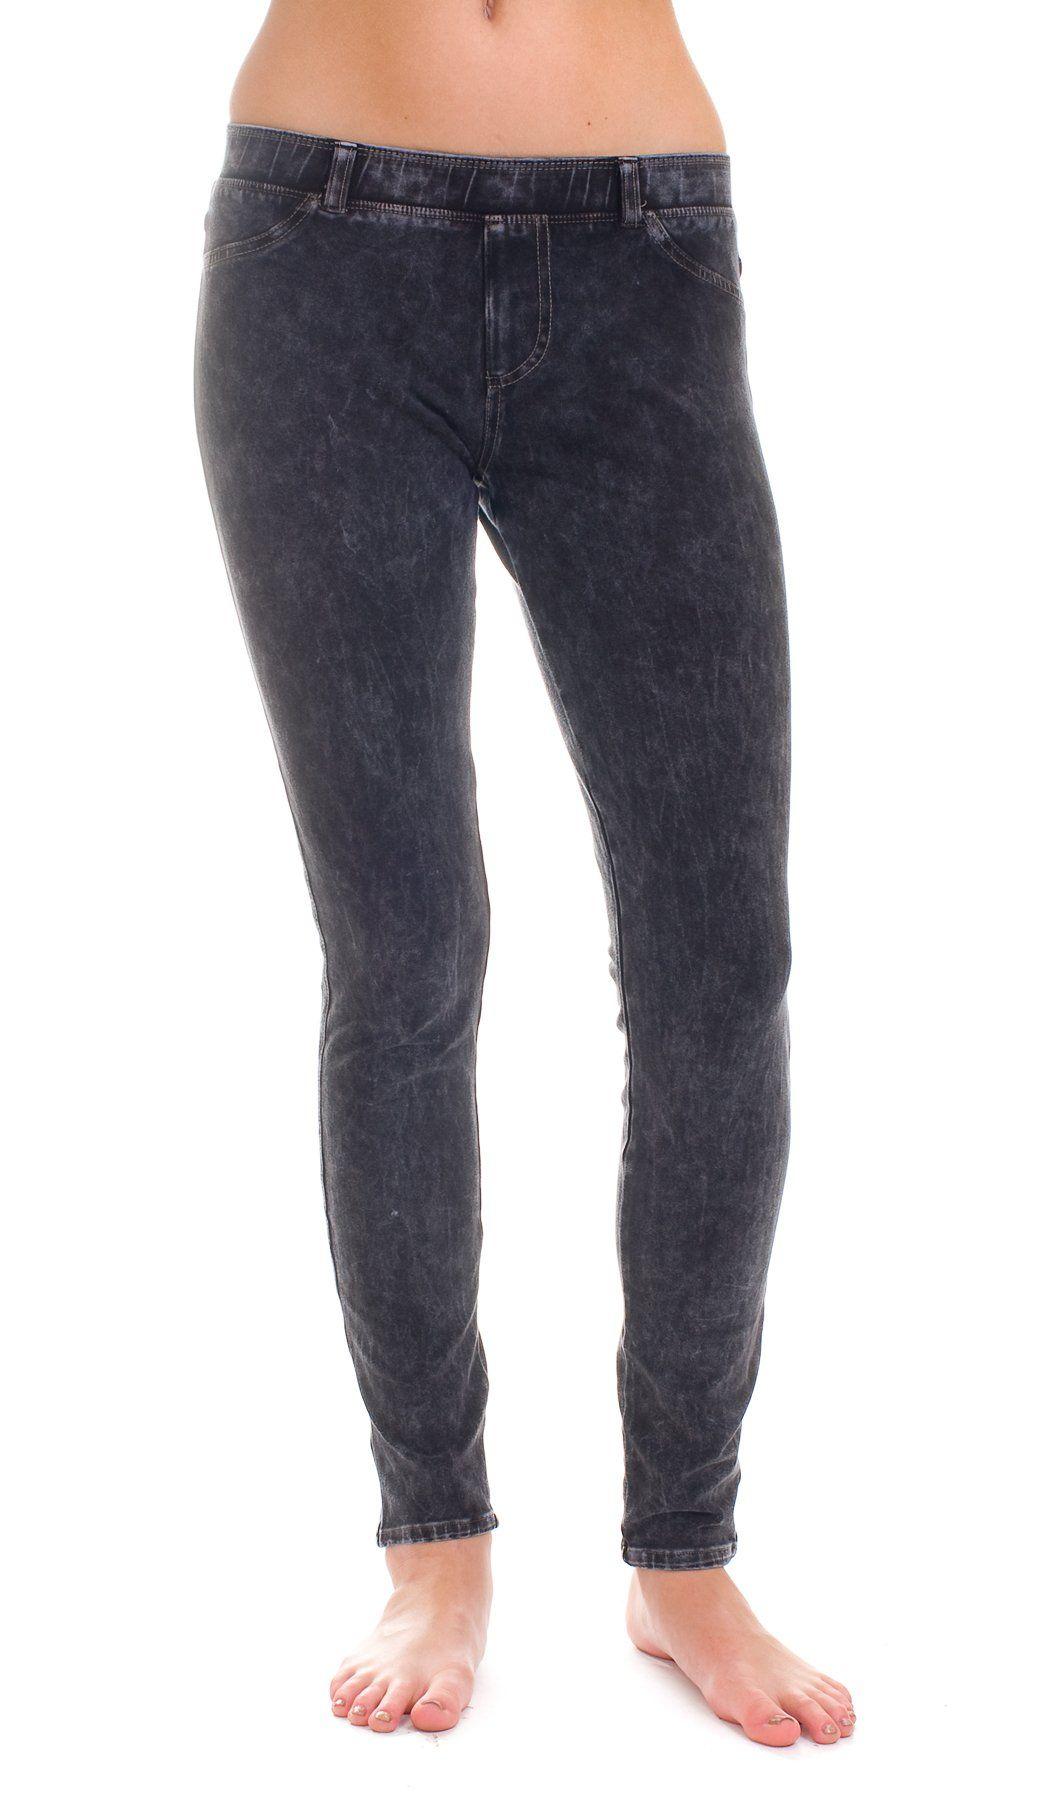 61b0ec8da6 Hard Tail denim wash leggings (charcoal) (small). 90% cotton/10 ...